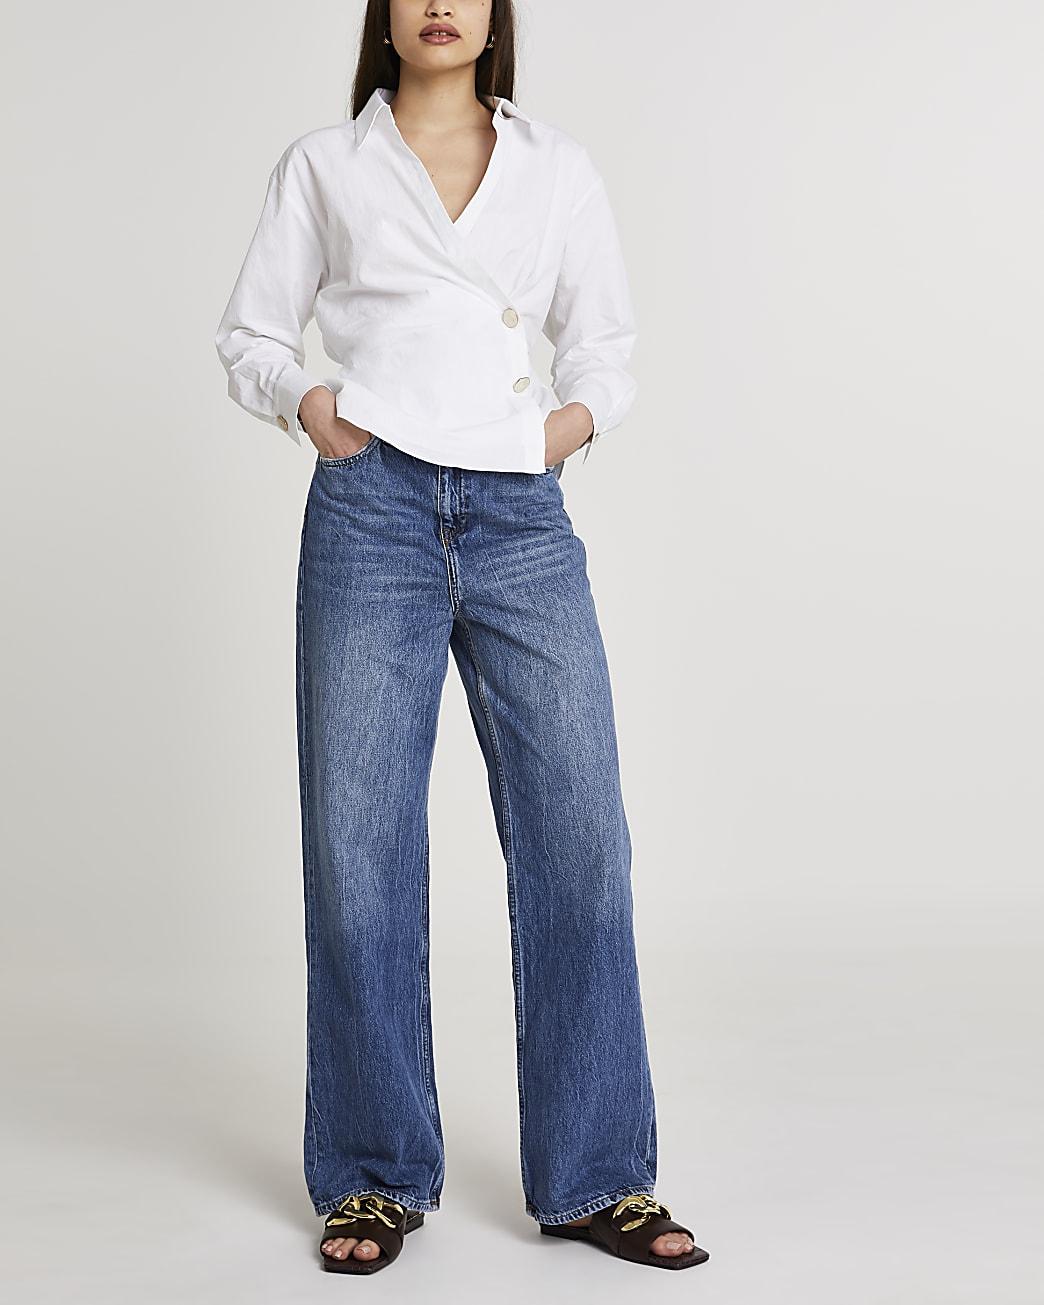 White side tuck long sleeve shirt